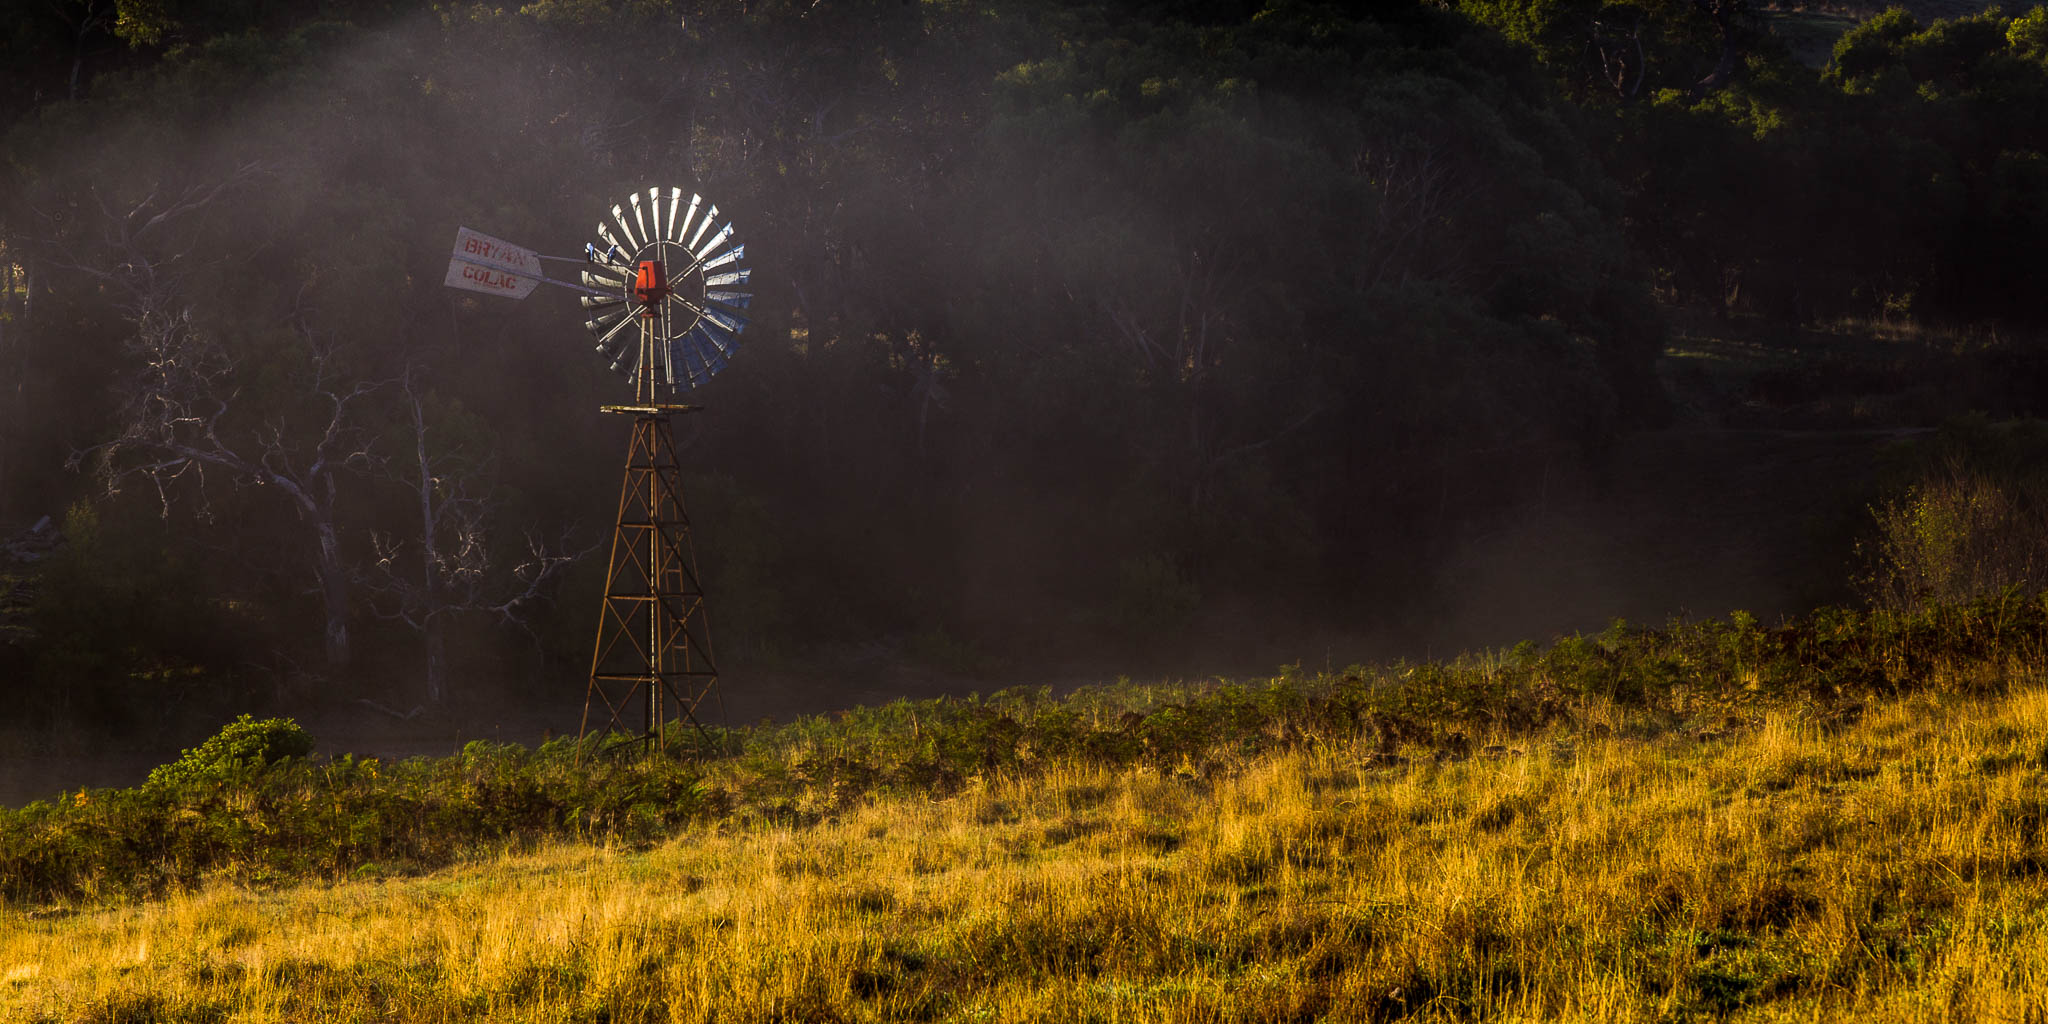 The Woodacre Windmill